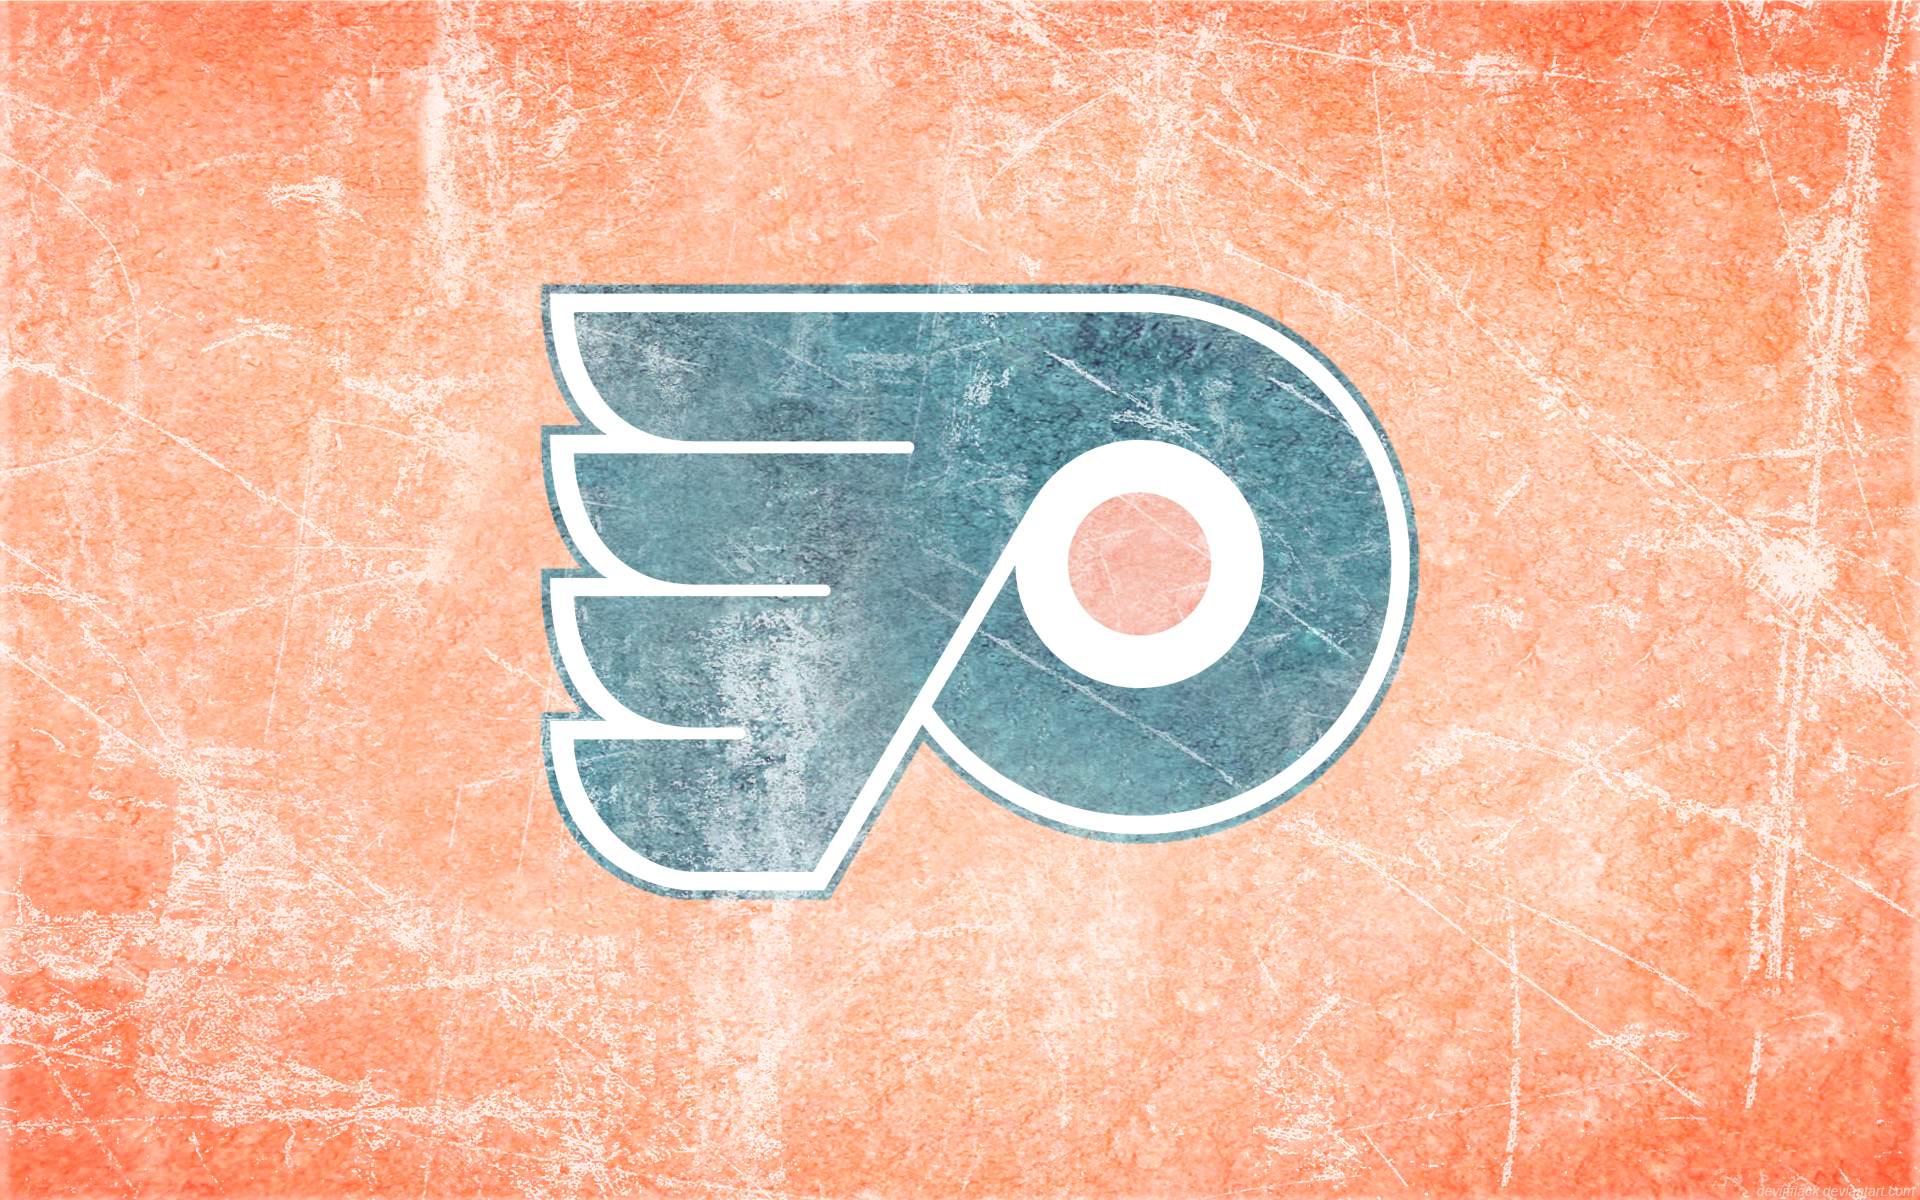 Philadelphia Flyers Desktop Wallpaper Collection Sports Geekery 1920x1200